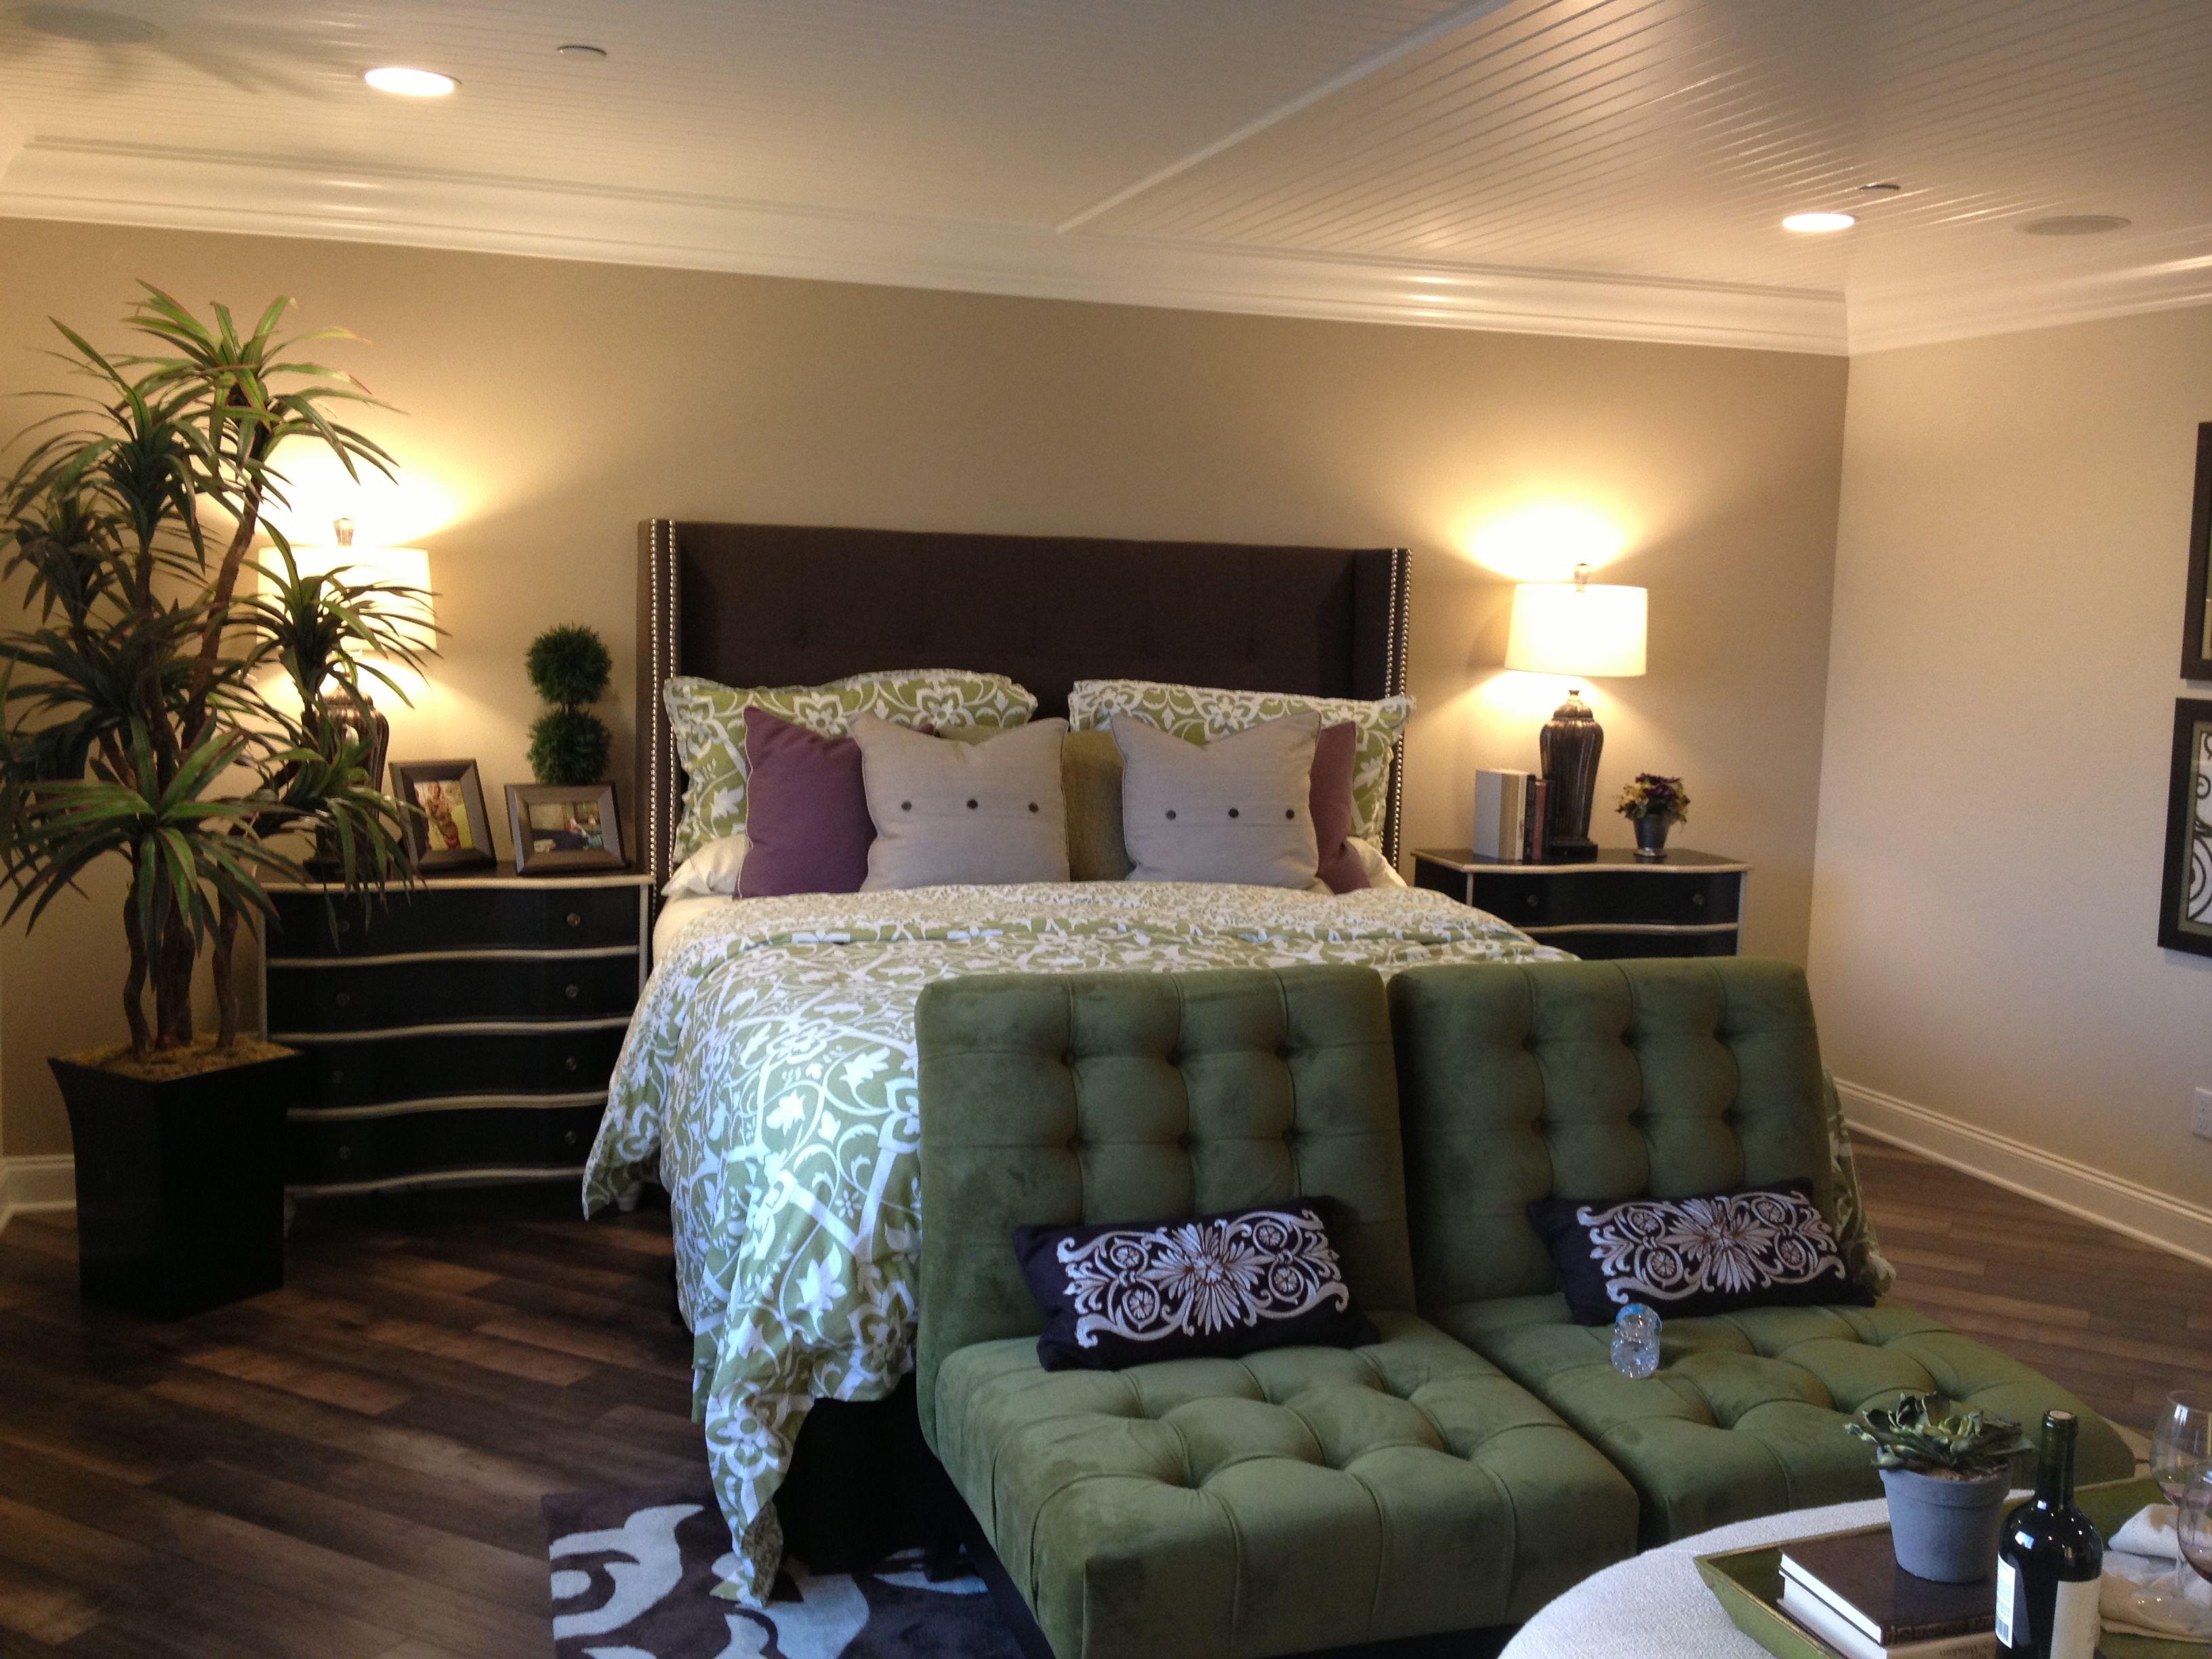 12 Simple Cozy Master Bedroom Ideas Ideas Imageries Billion Estates 80810